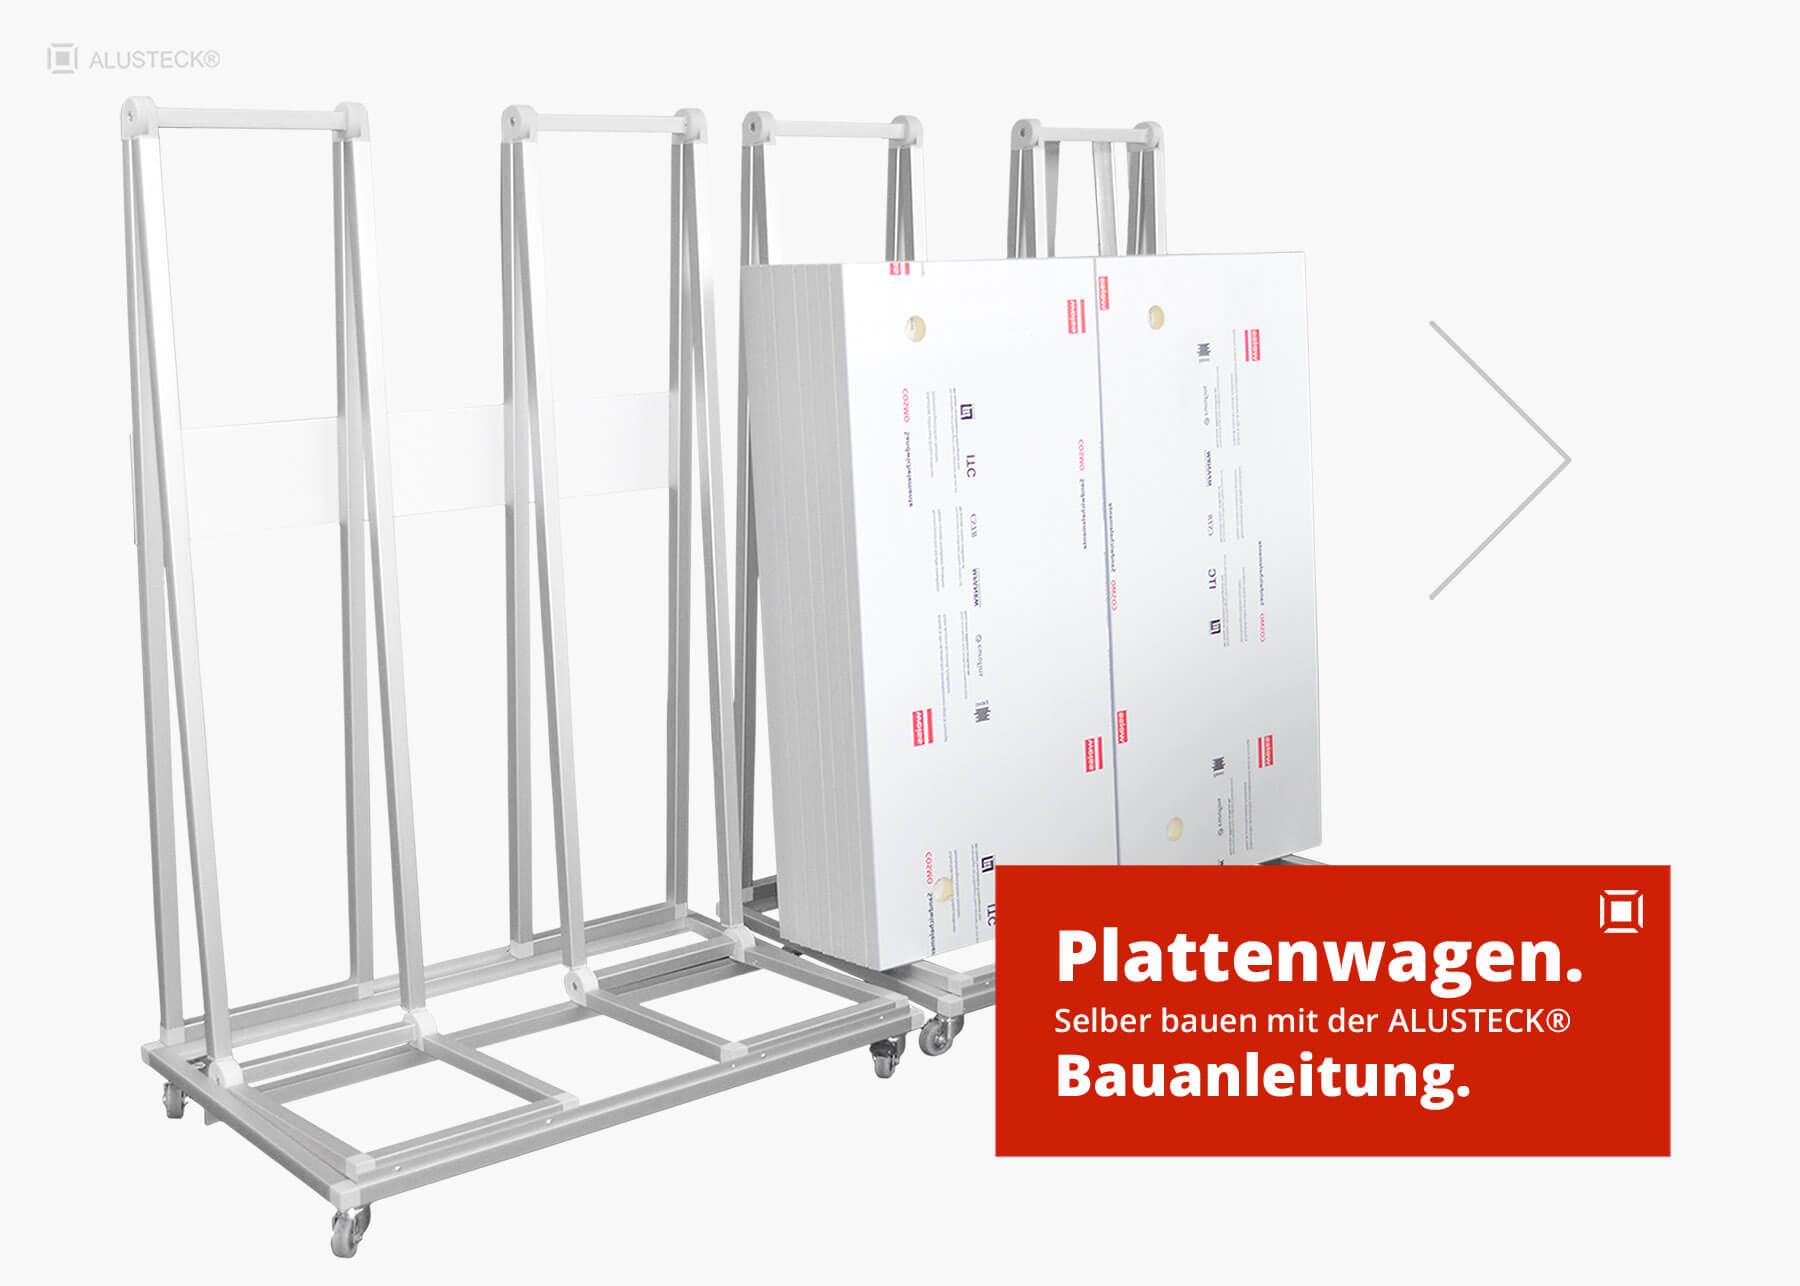 plattenwagen selber bauen - bauanleitung mit alusteck®